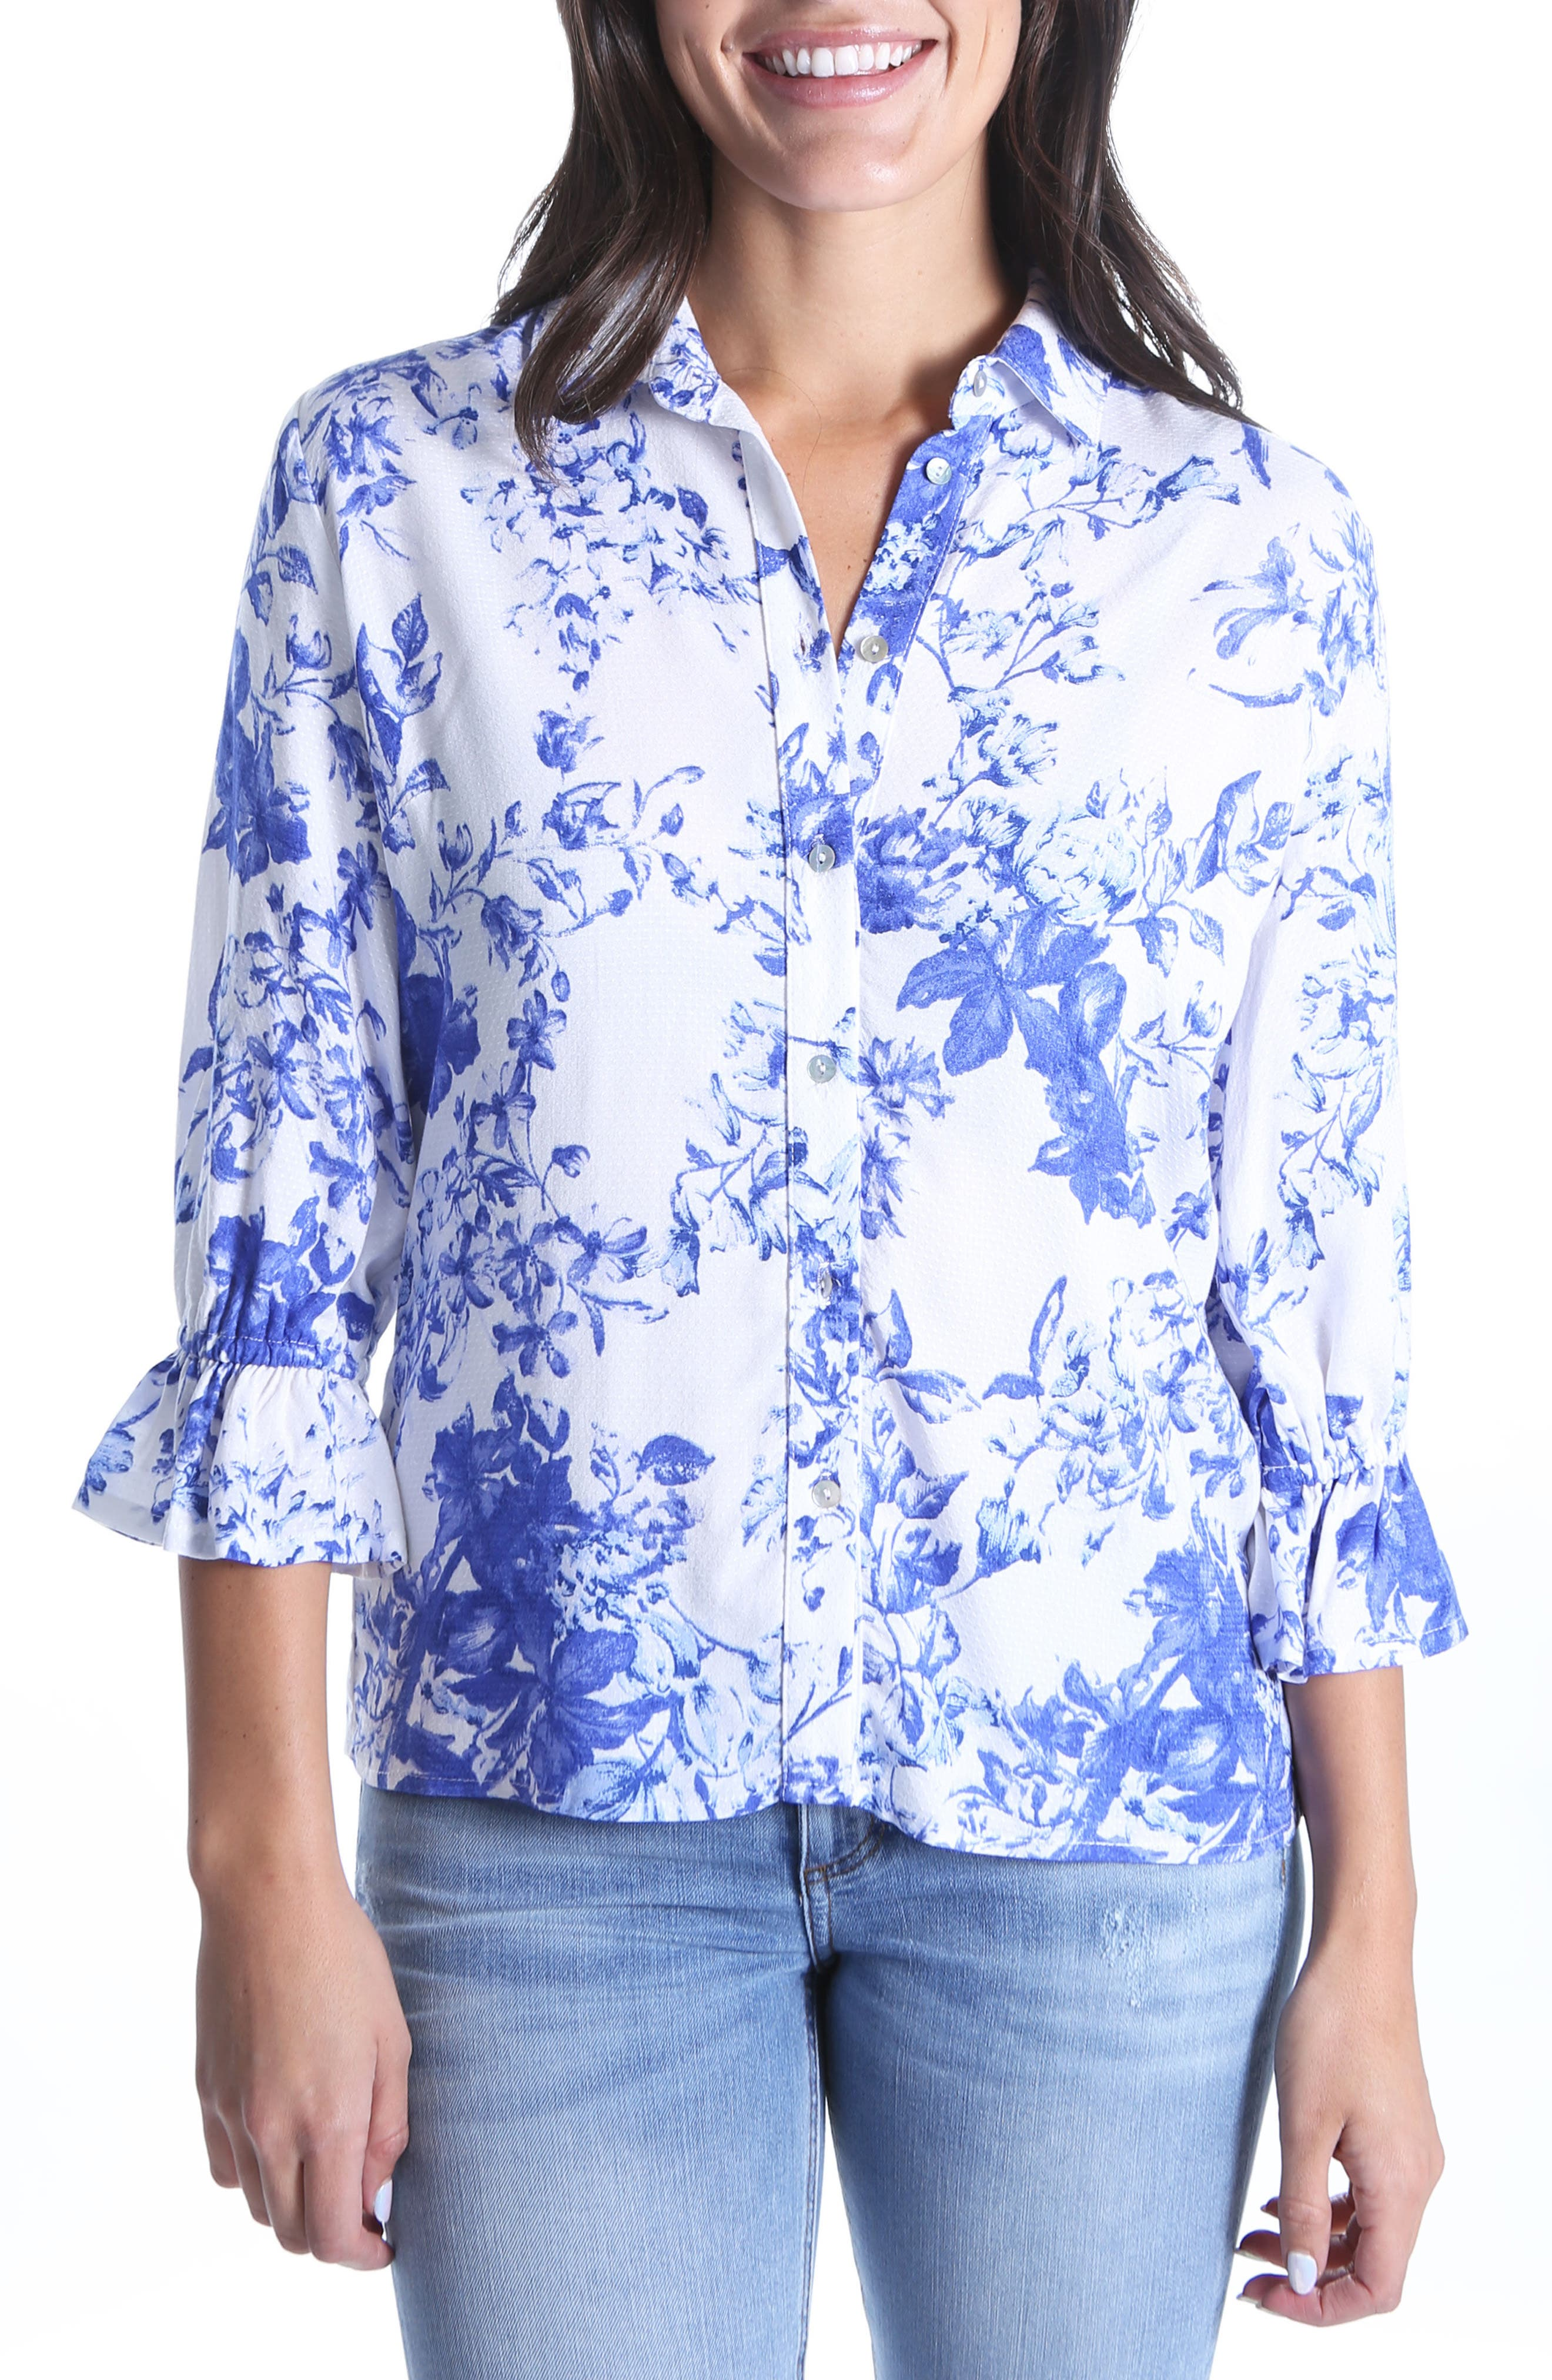 Elza Ruffle Sleeve Top,                         Main,                         color, WHITE/ BLUE